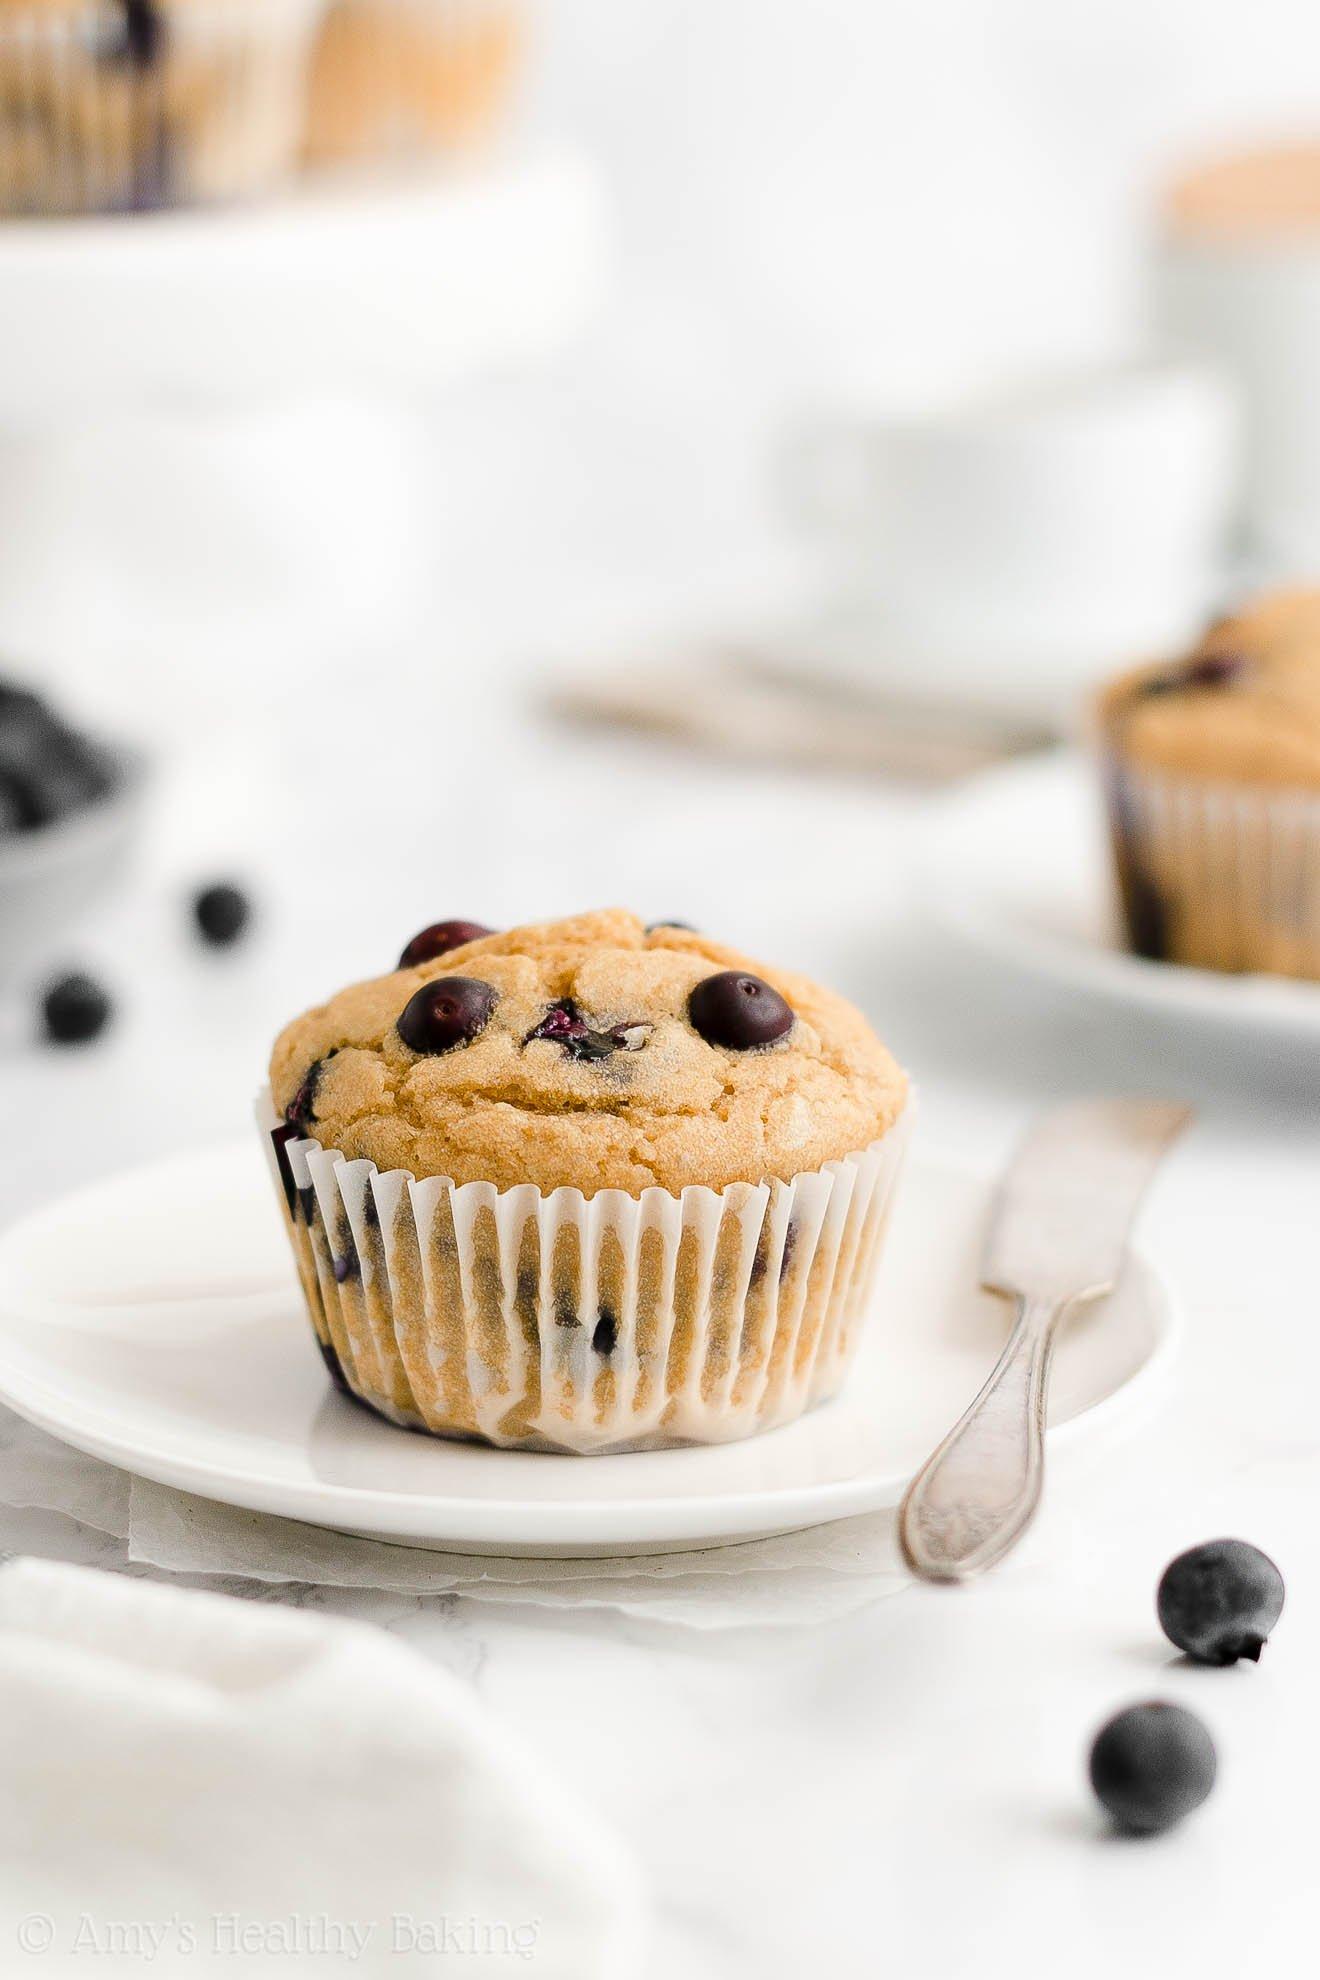 ULTIMATE Best Easy Healthy Gluten Free Low Calorie Yogurt Blueberry Muffins